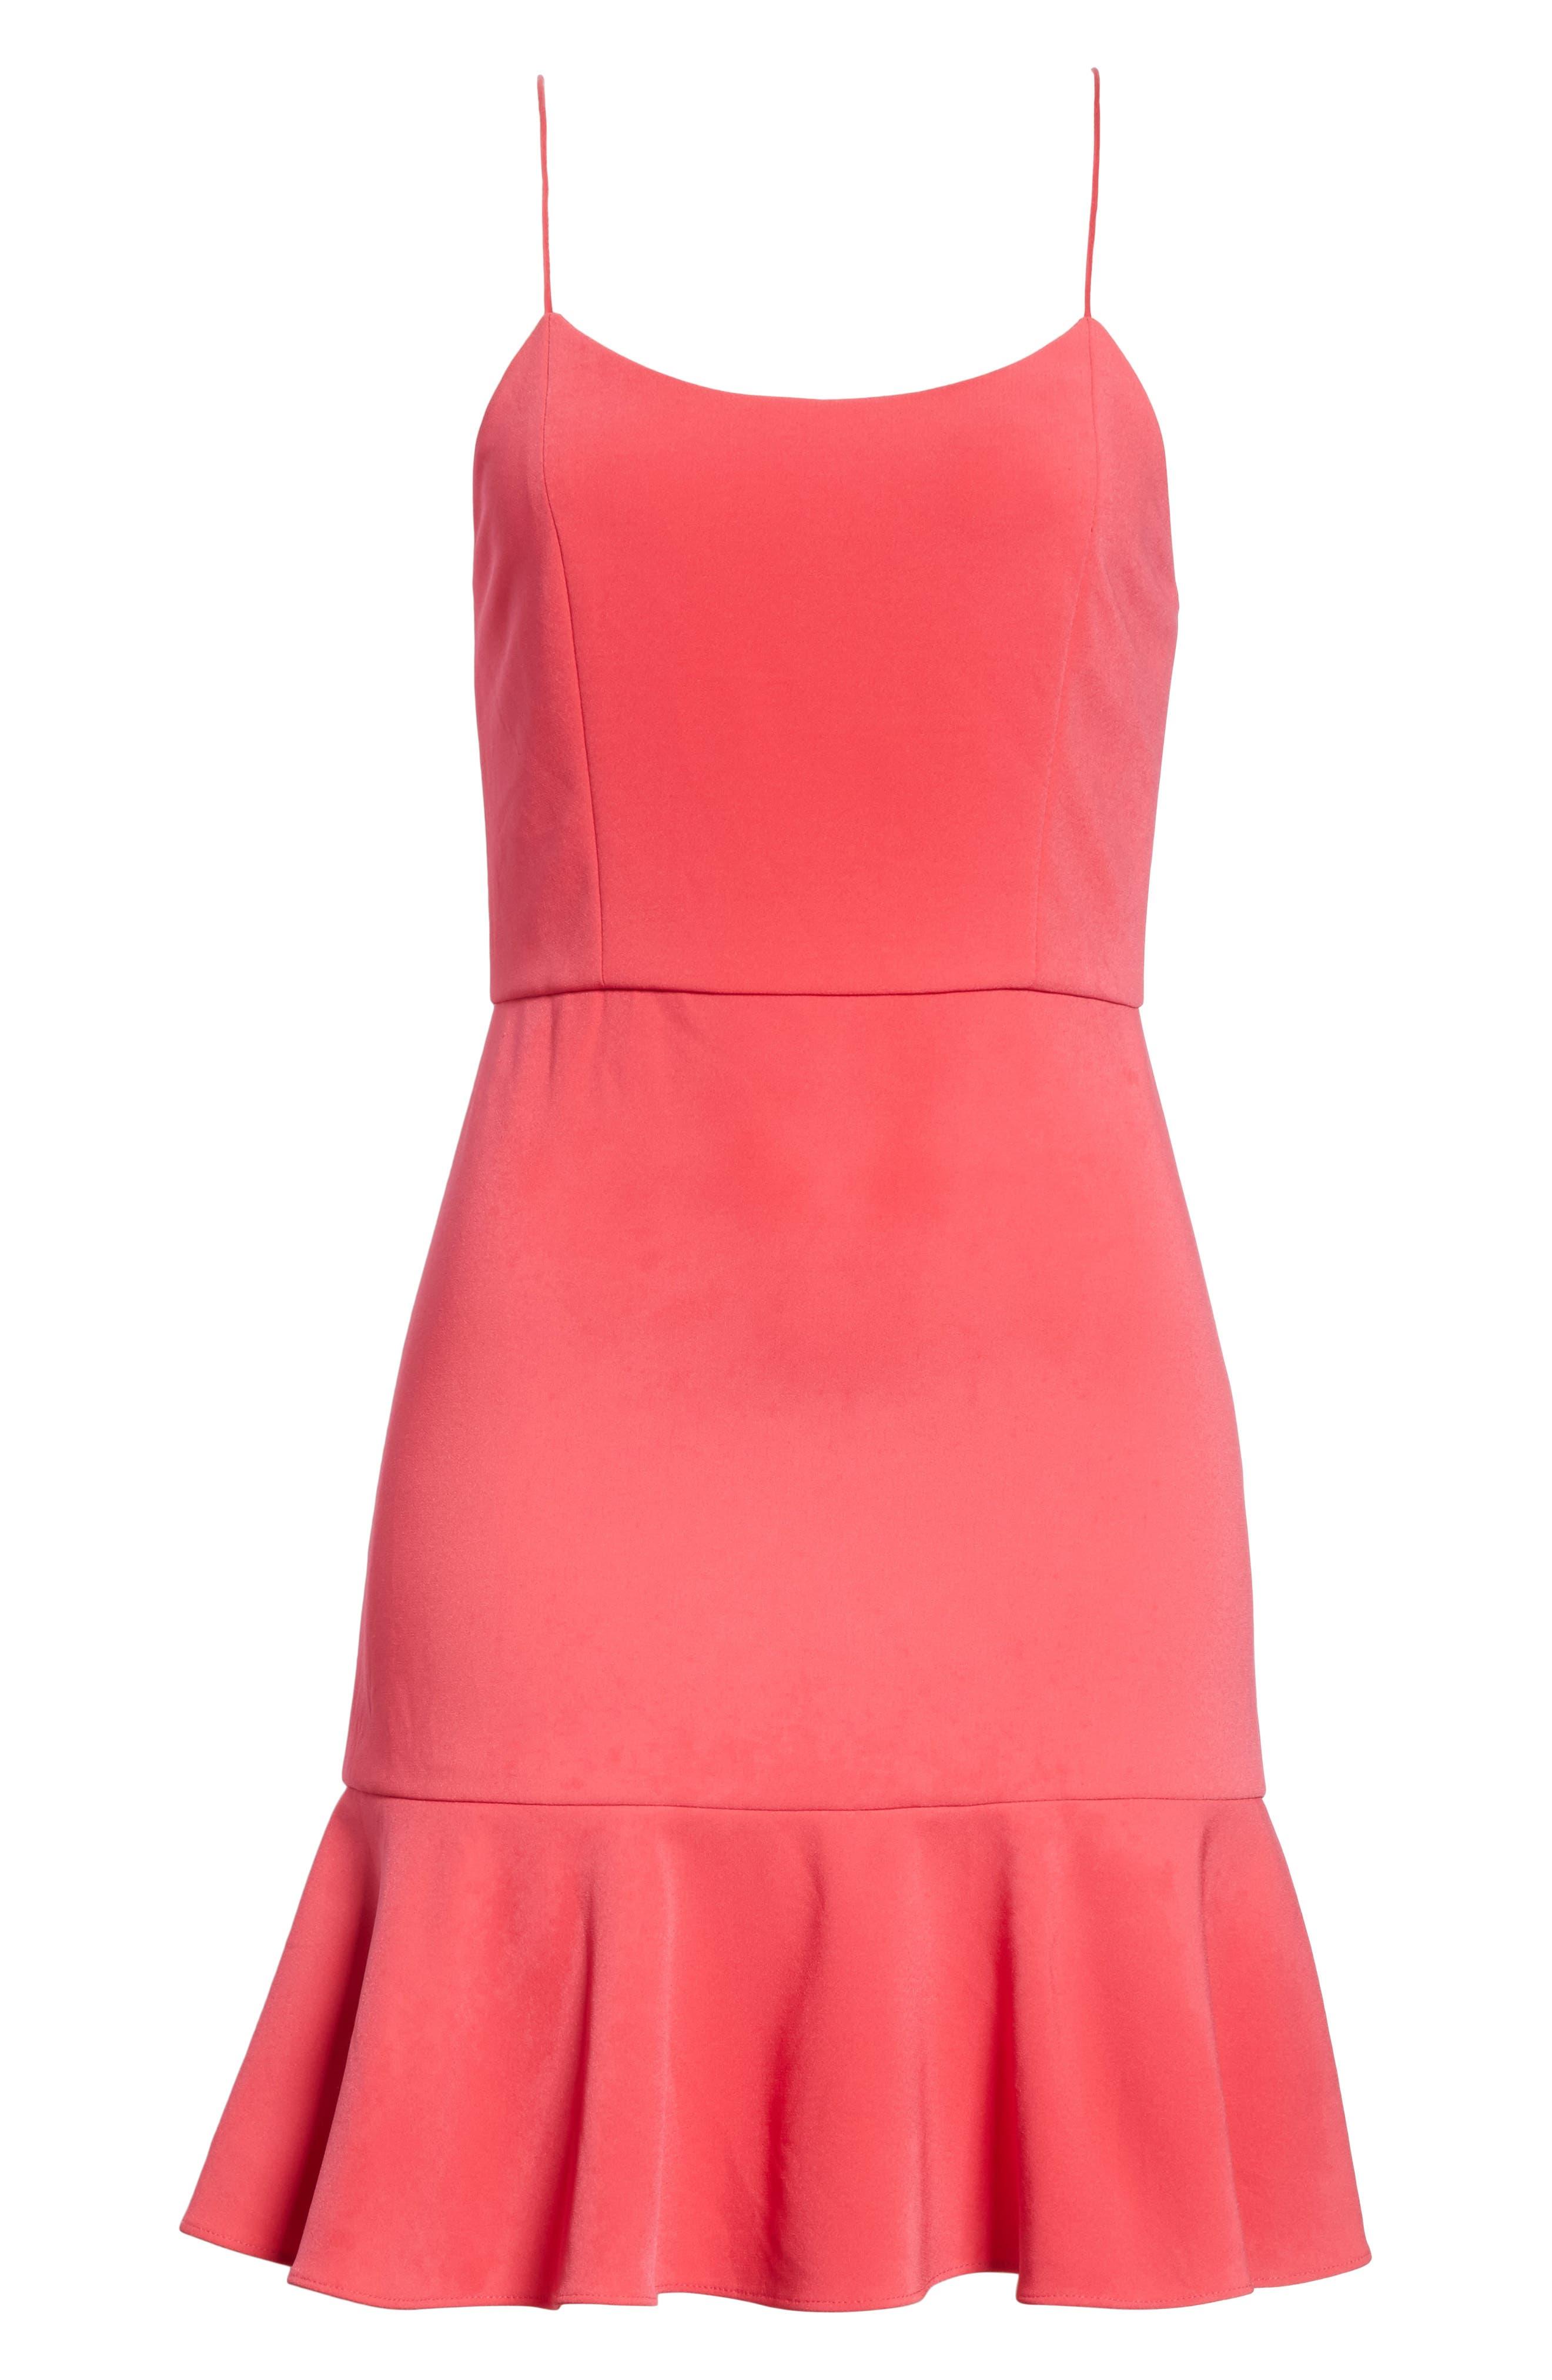 Andalasia Sleeveless Fit & Flare Dress,                             Alternate thumbnail 6, color,                             Watermelon